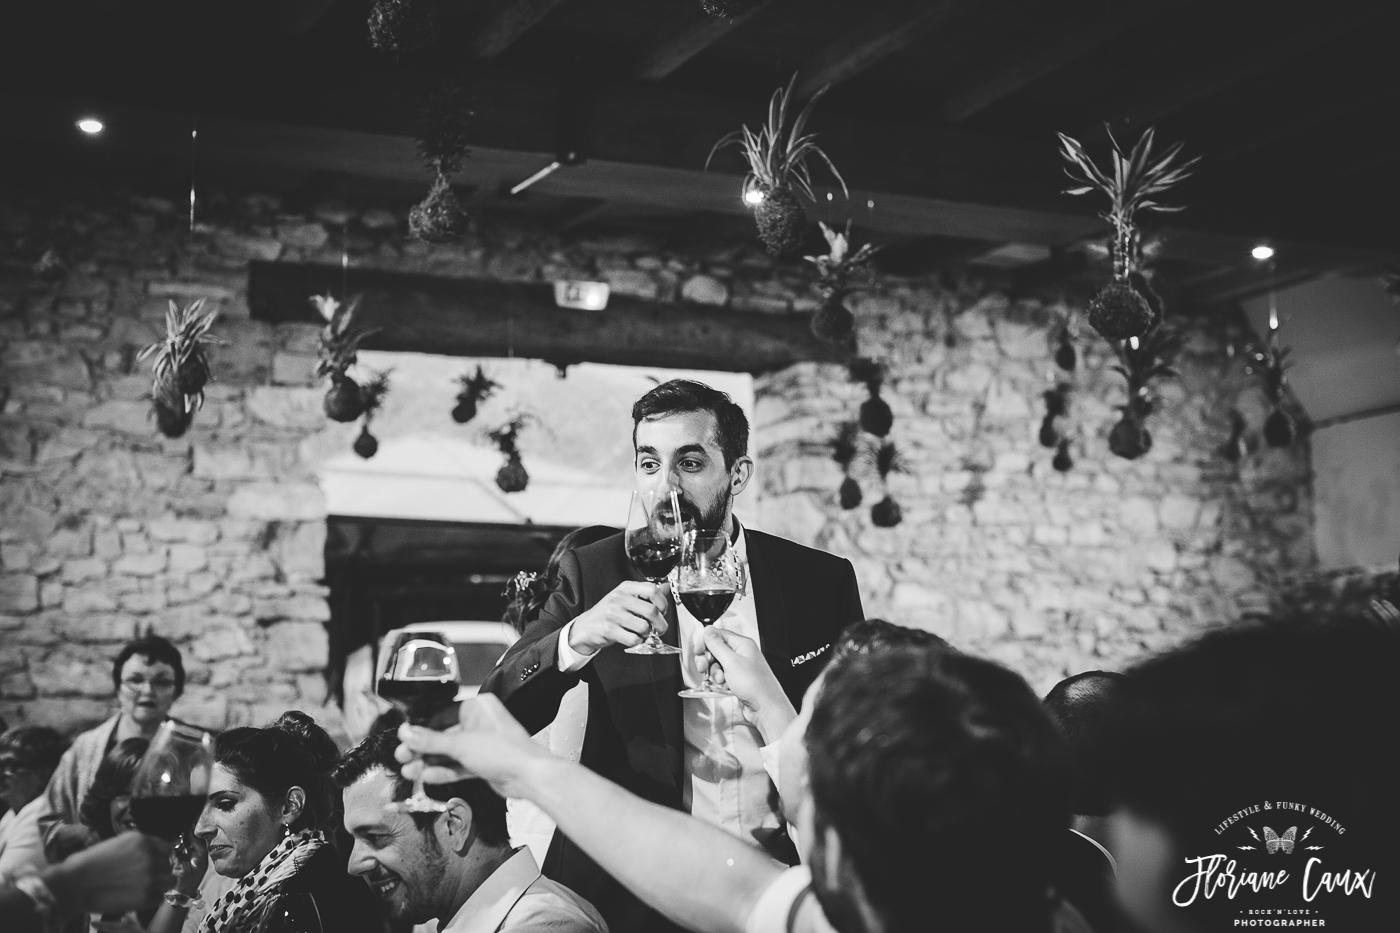 photographe-mariage-pays-basque-Floriane-Caux (94)